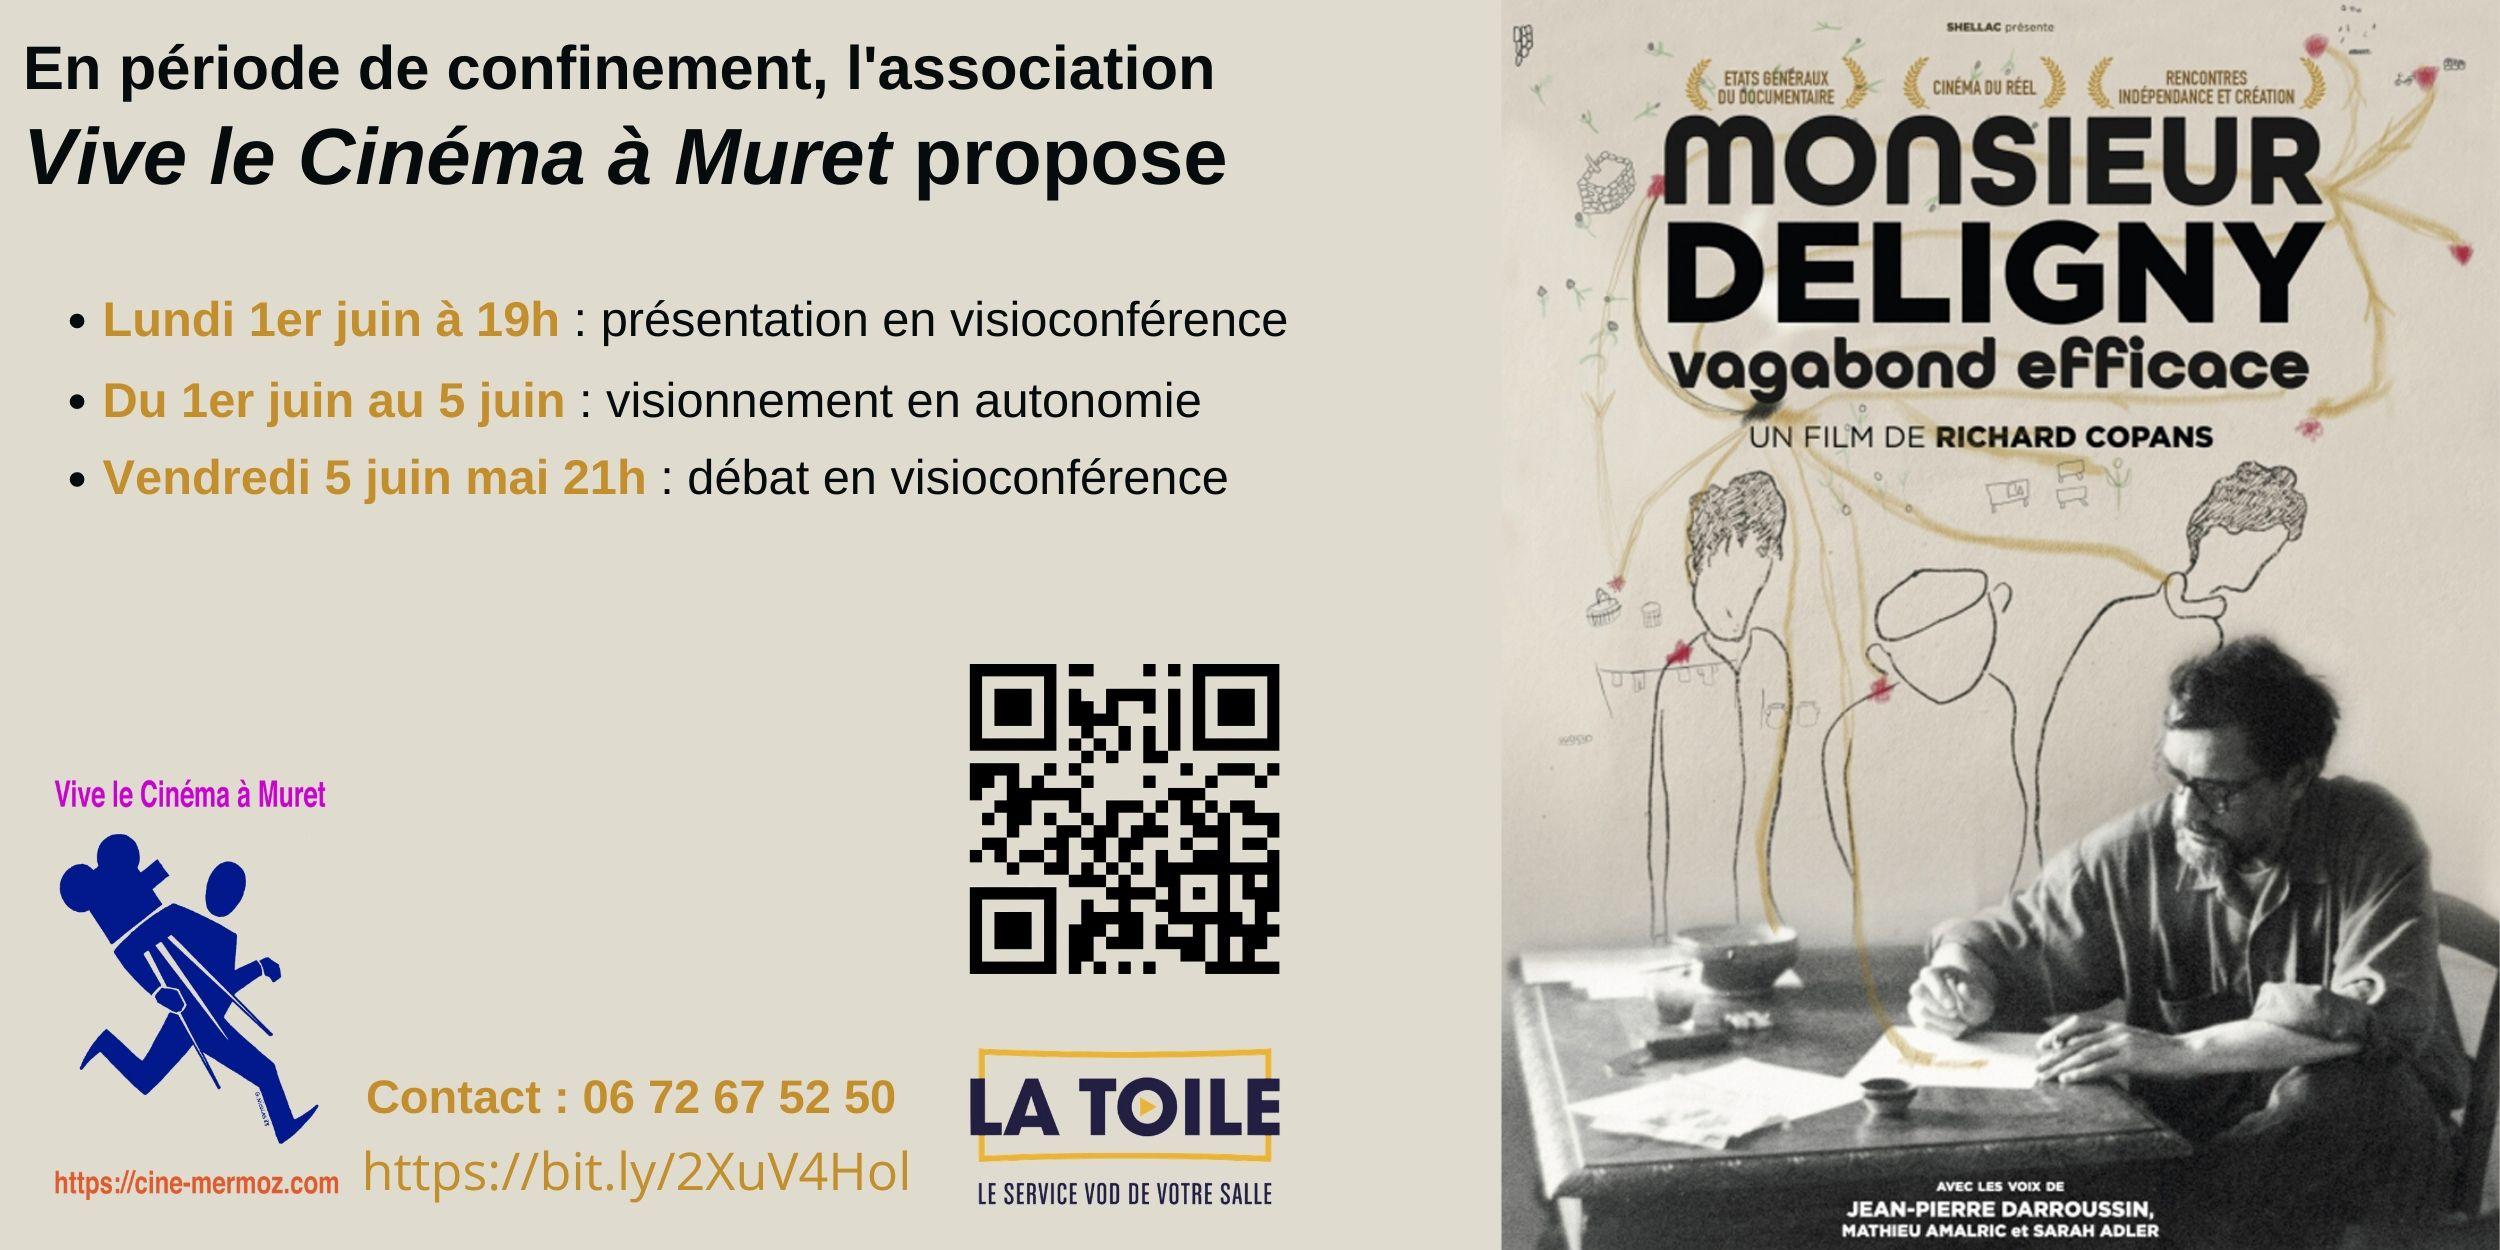 Monsieur Deligny